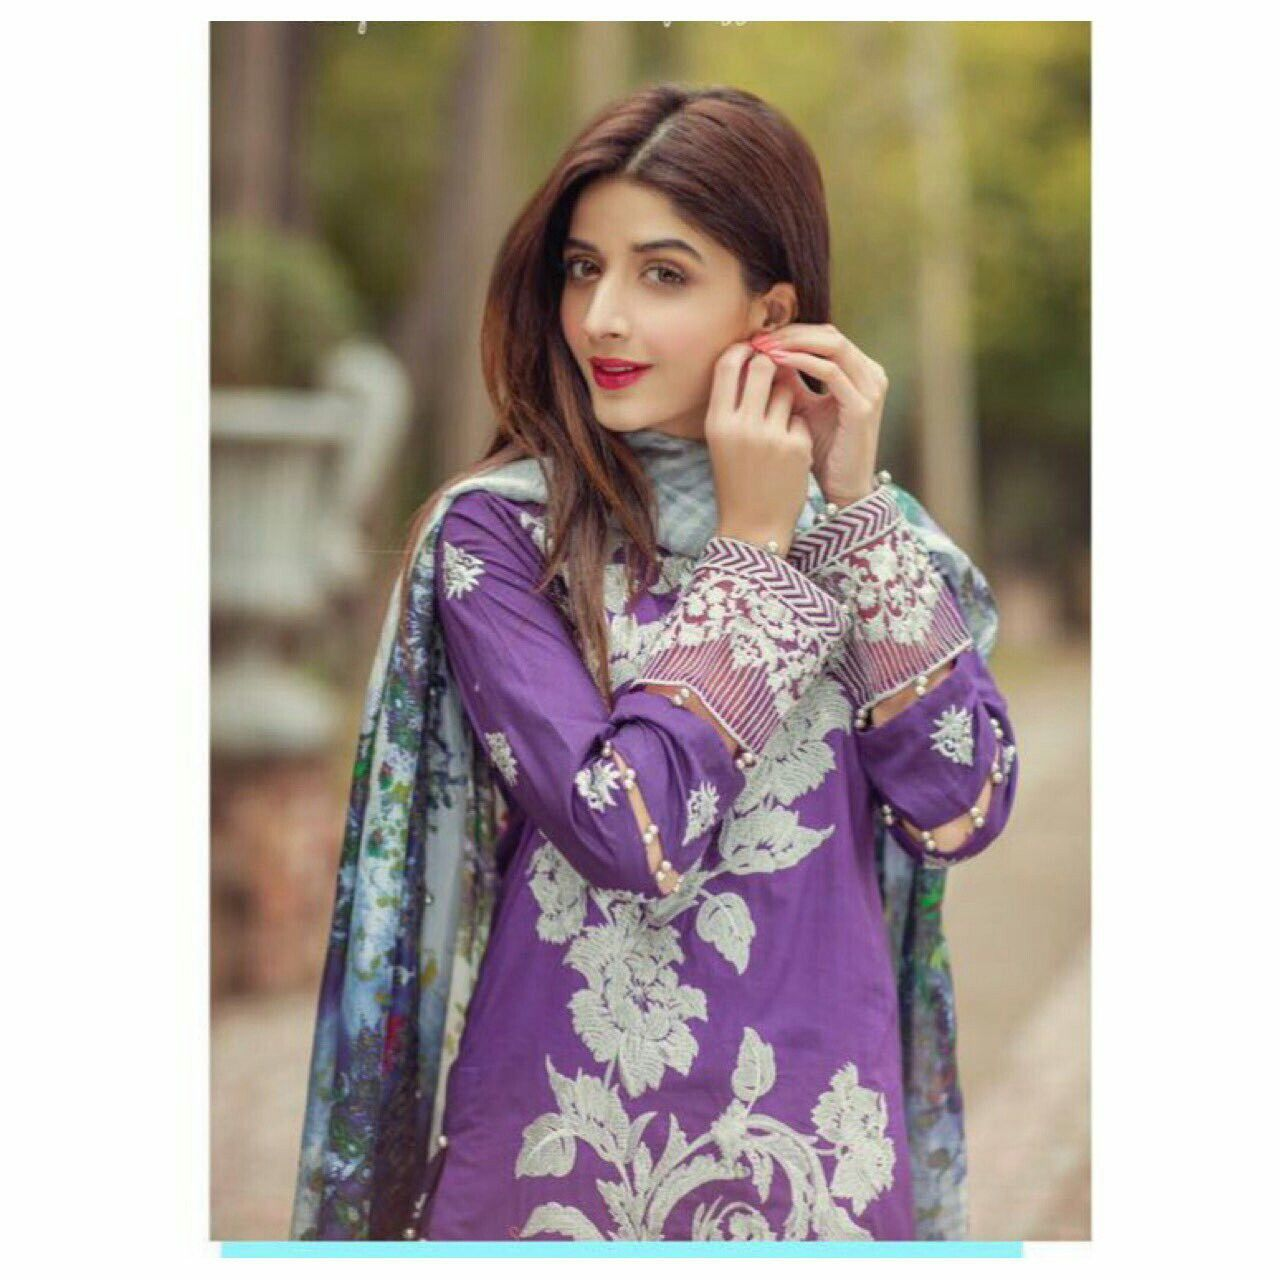 Mawra Hocane | Pakistani celebrities/drama | Pinterest